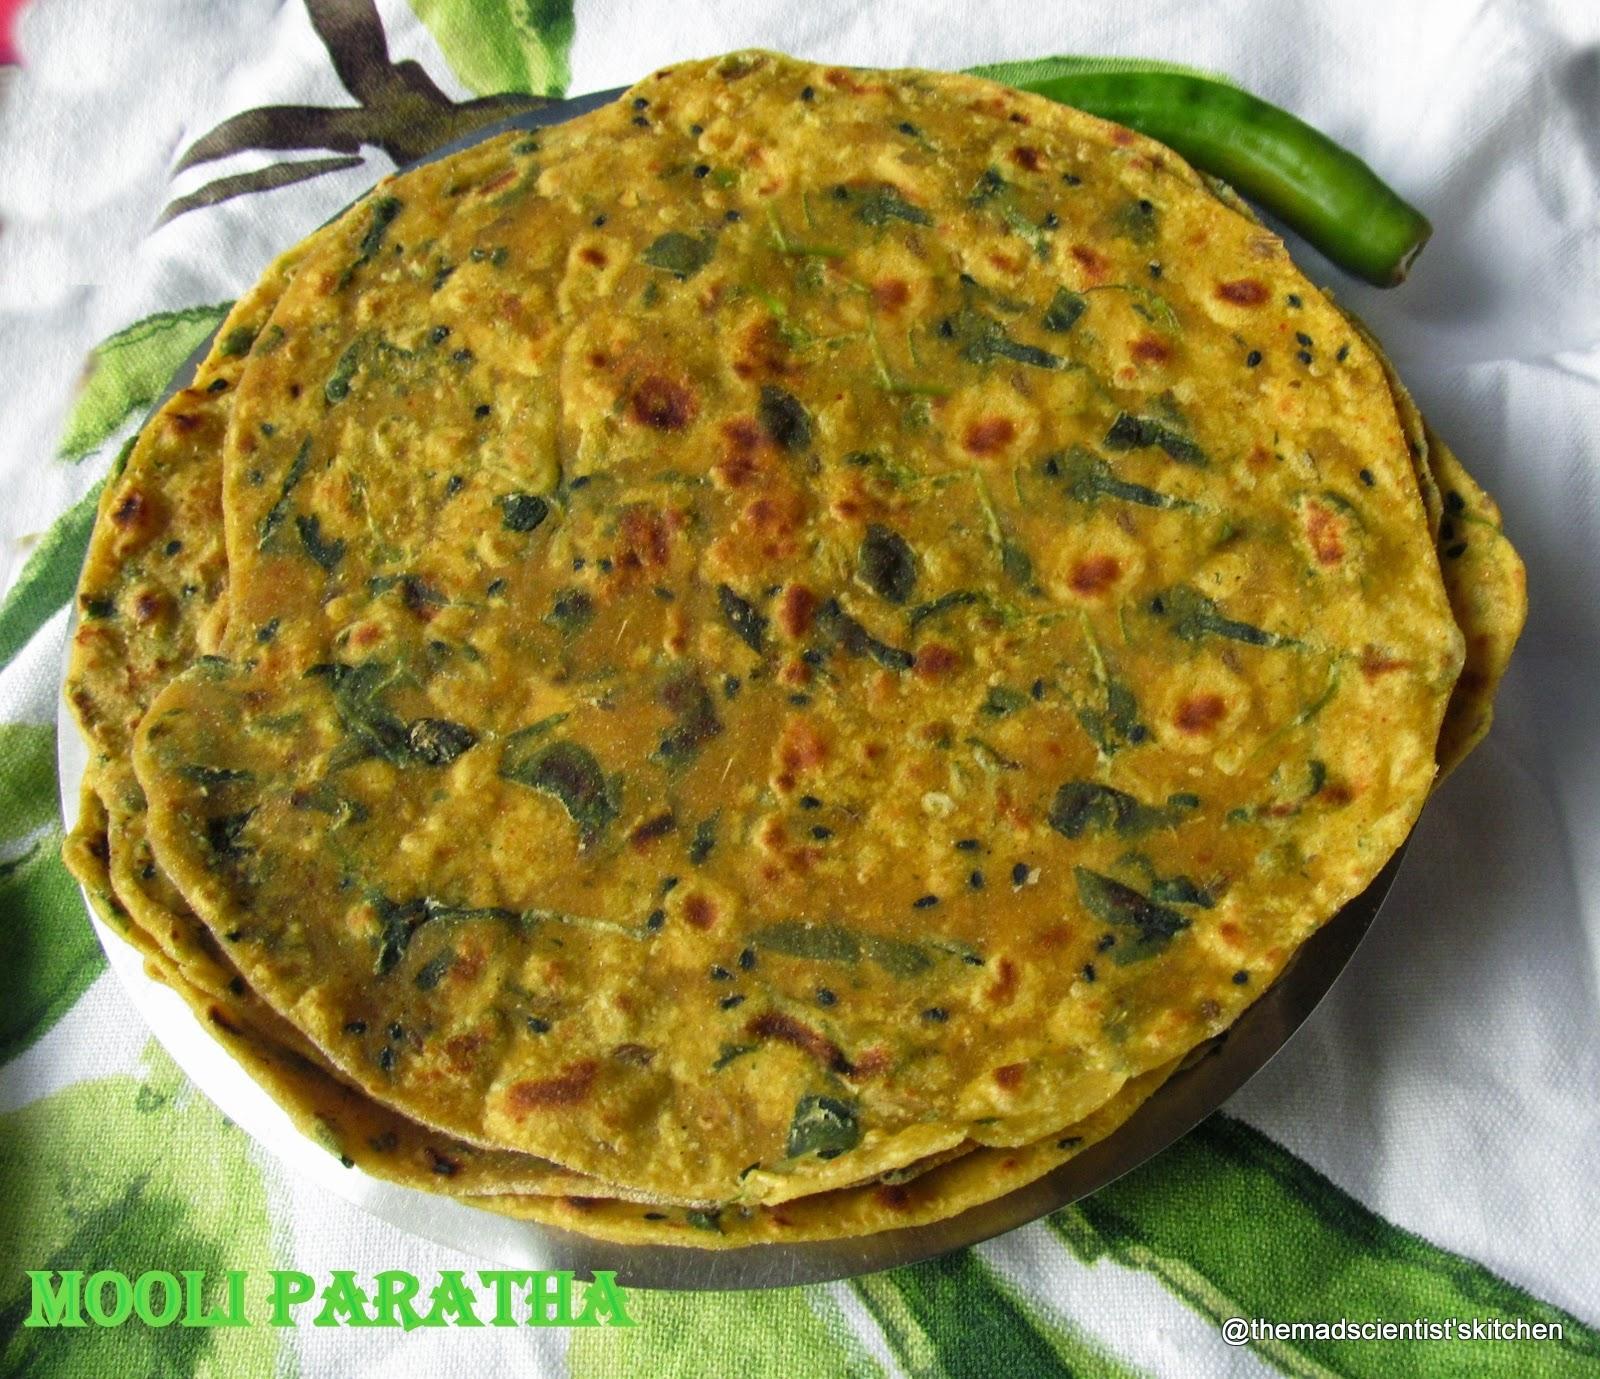 Mooli ke Parathe/ Raddish Paratha Indian Flat Bread